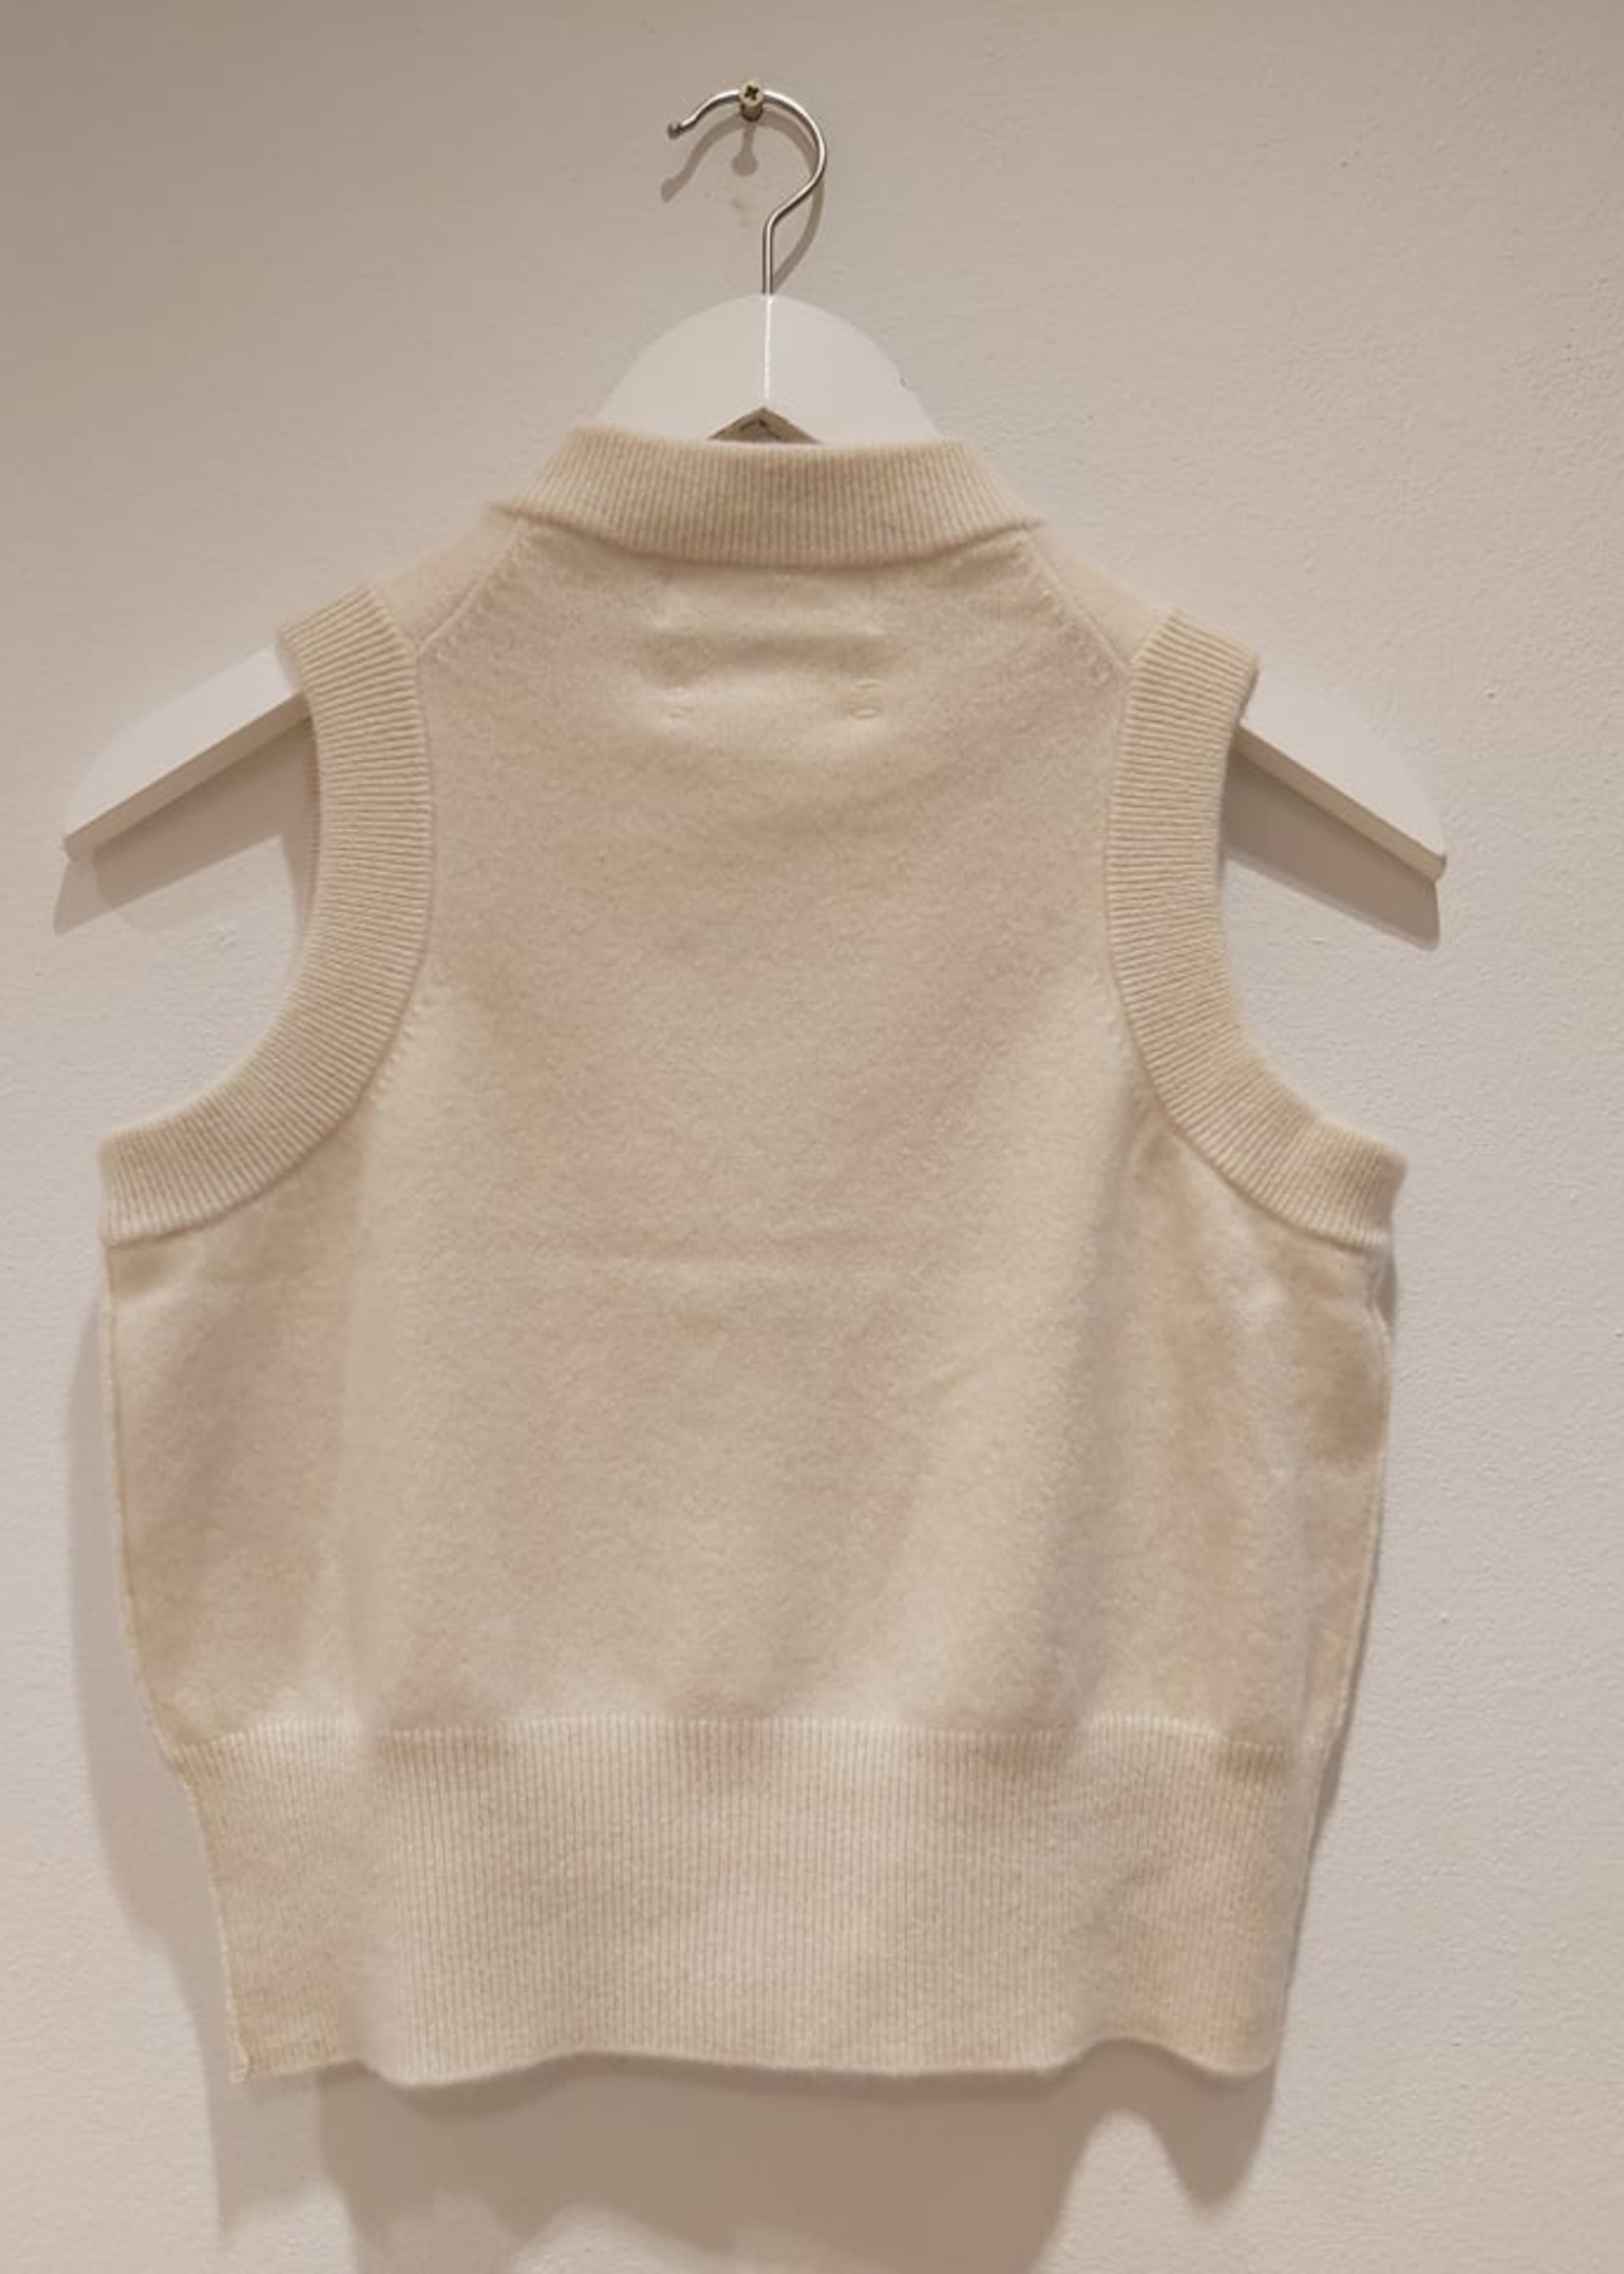 extremecashmere x extreme cashmere x corset cream